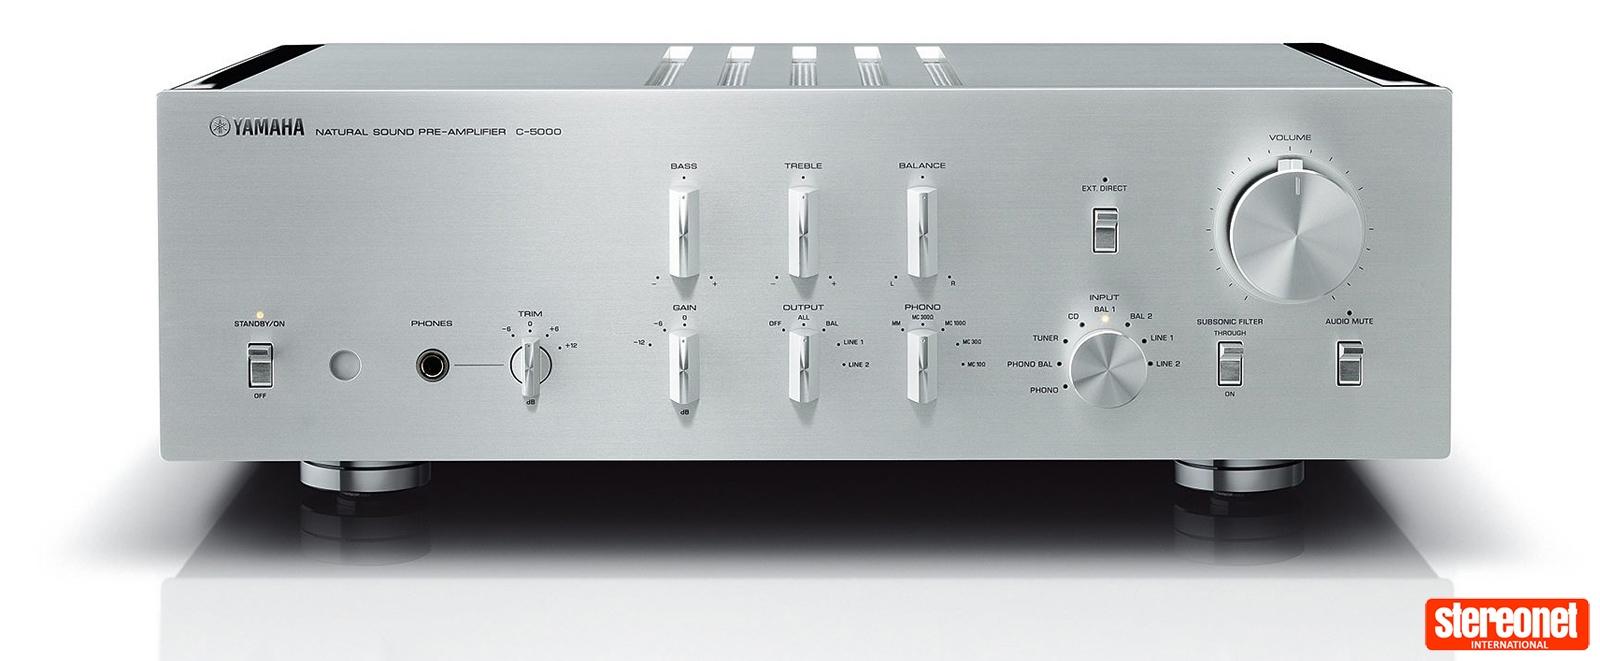 Yamaha C-5000 Pre-amplifier 2018